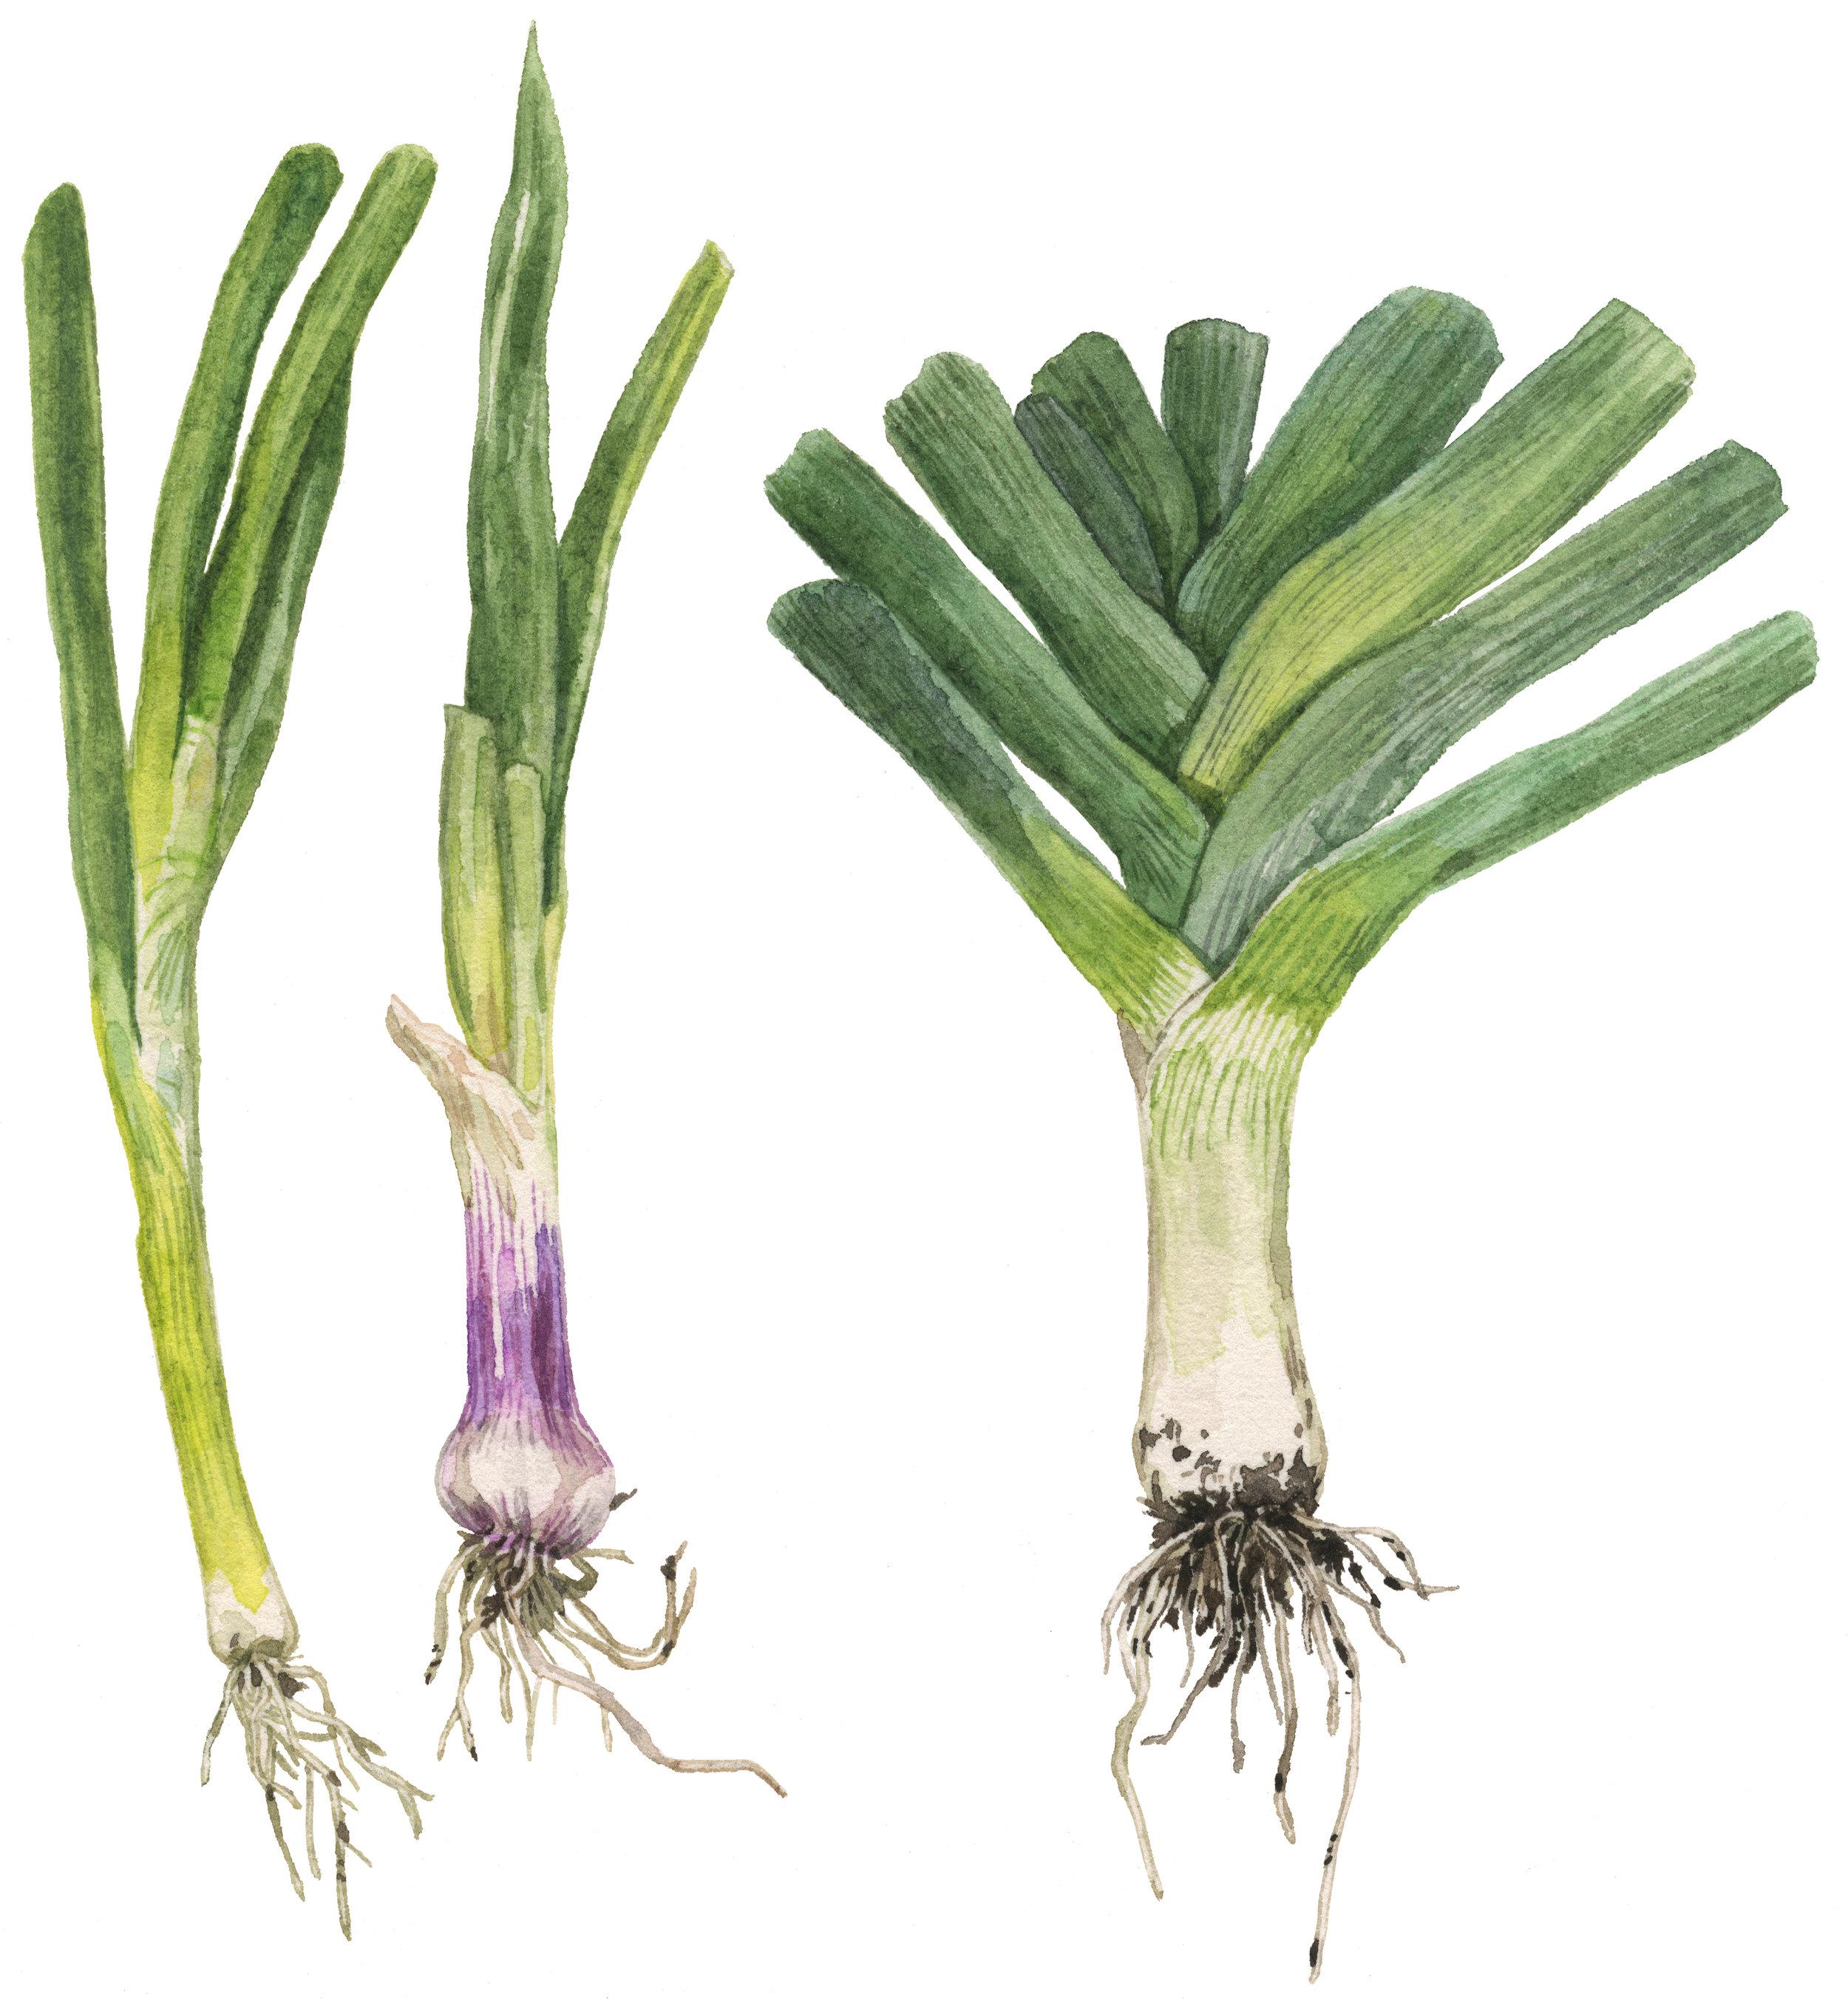 6-onions-lrg.jpg